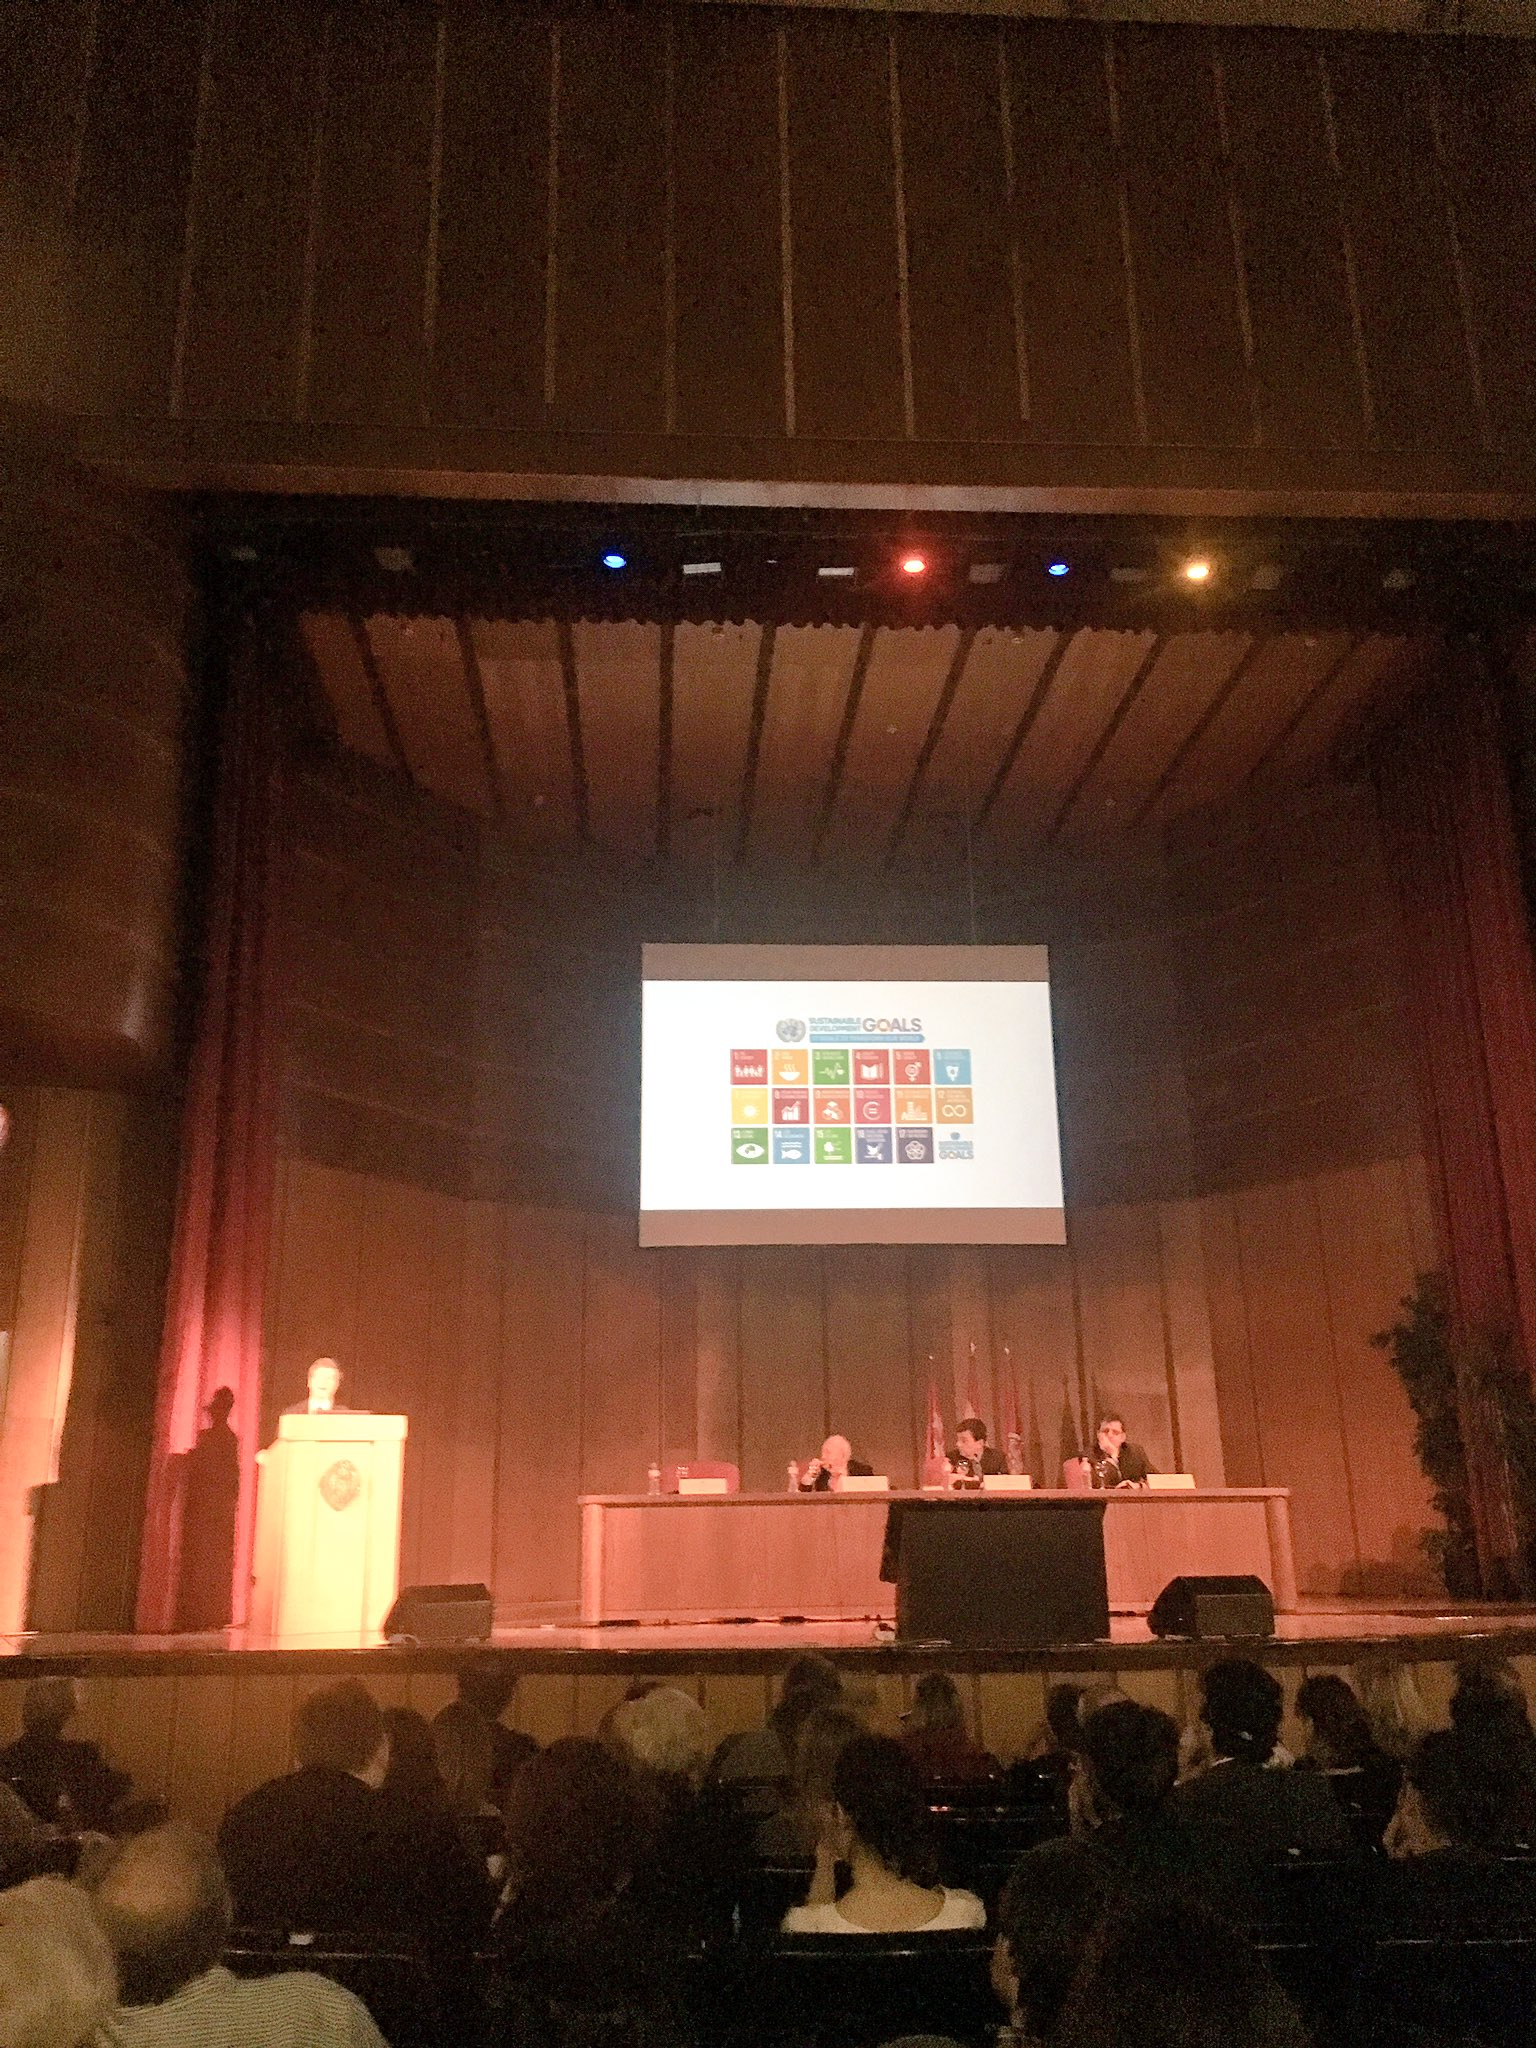 Prof. @JeffDSachs talking about #SDGs #Agenda2030 #ODS at @unicomplutense https://t.co/l5WfxbsZVb